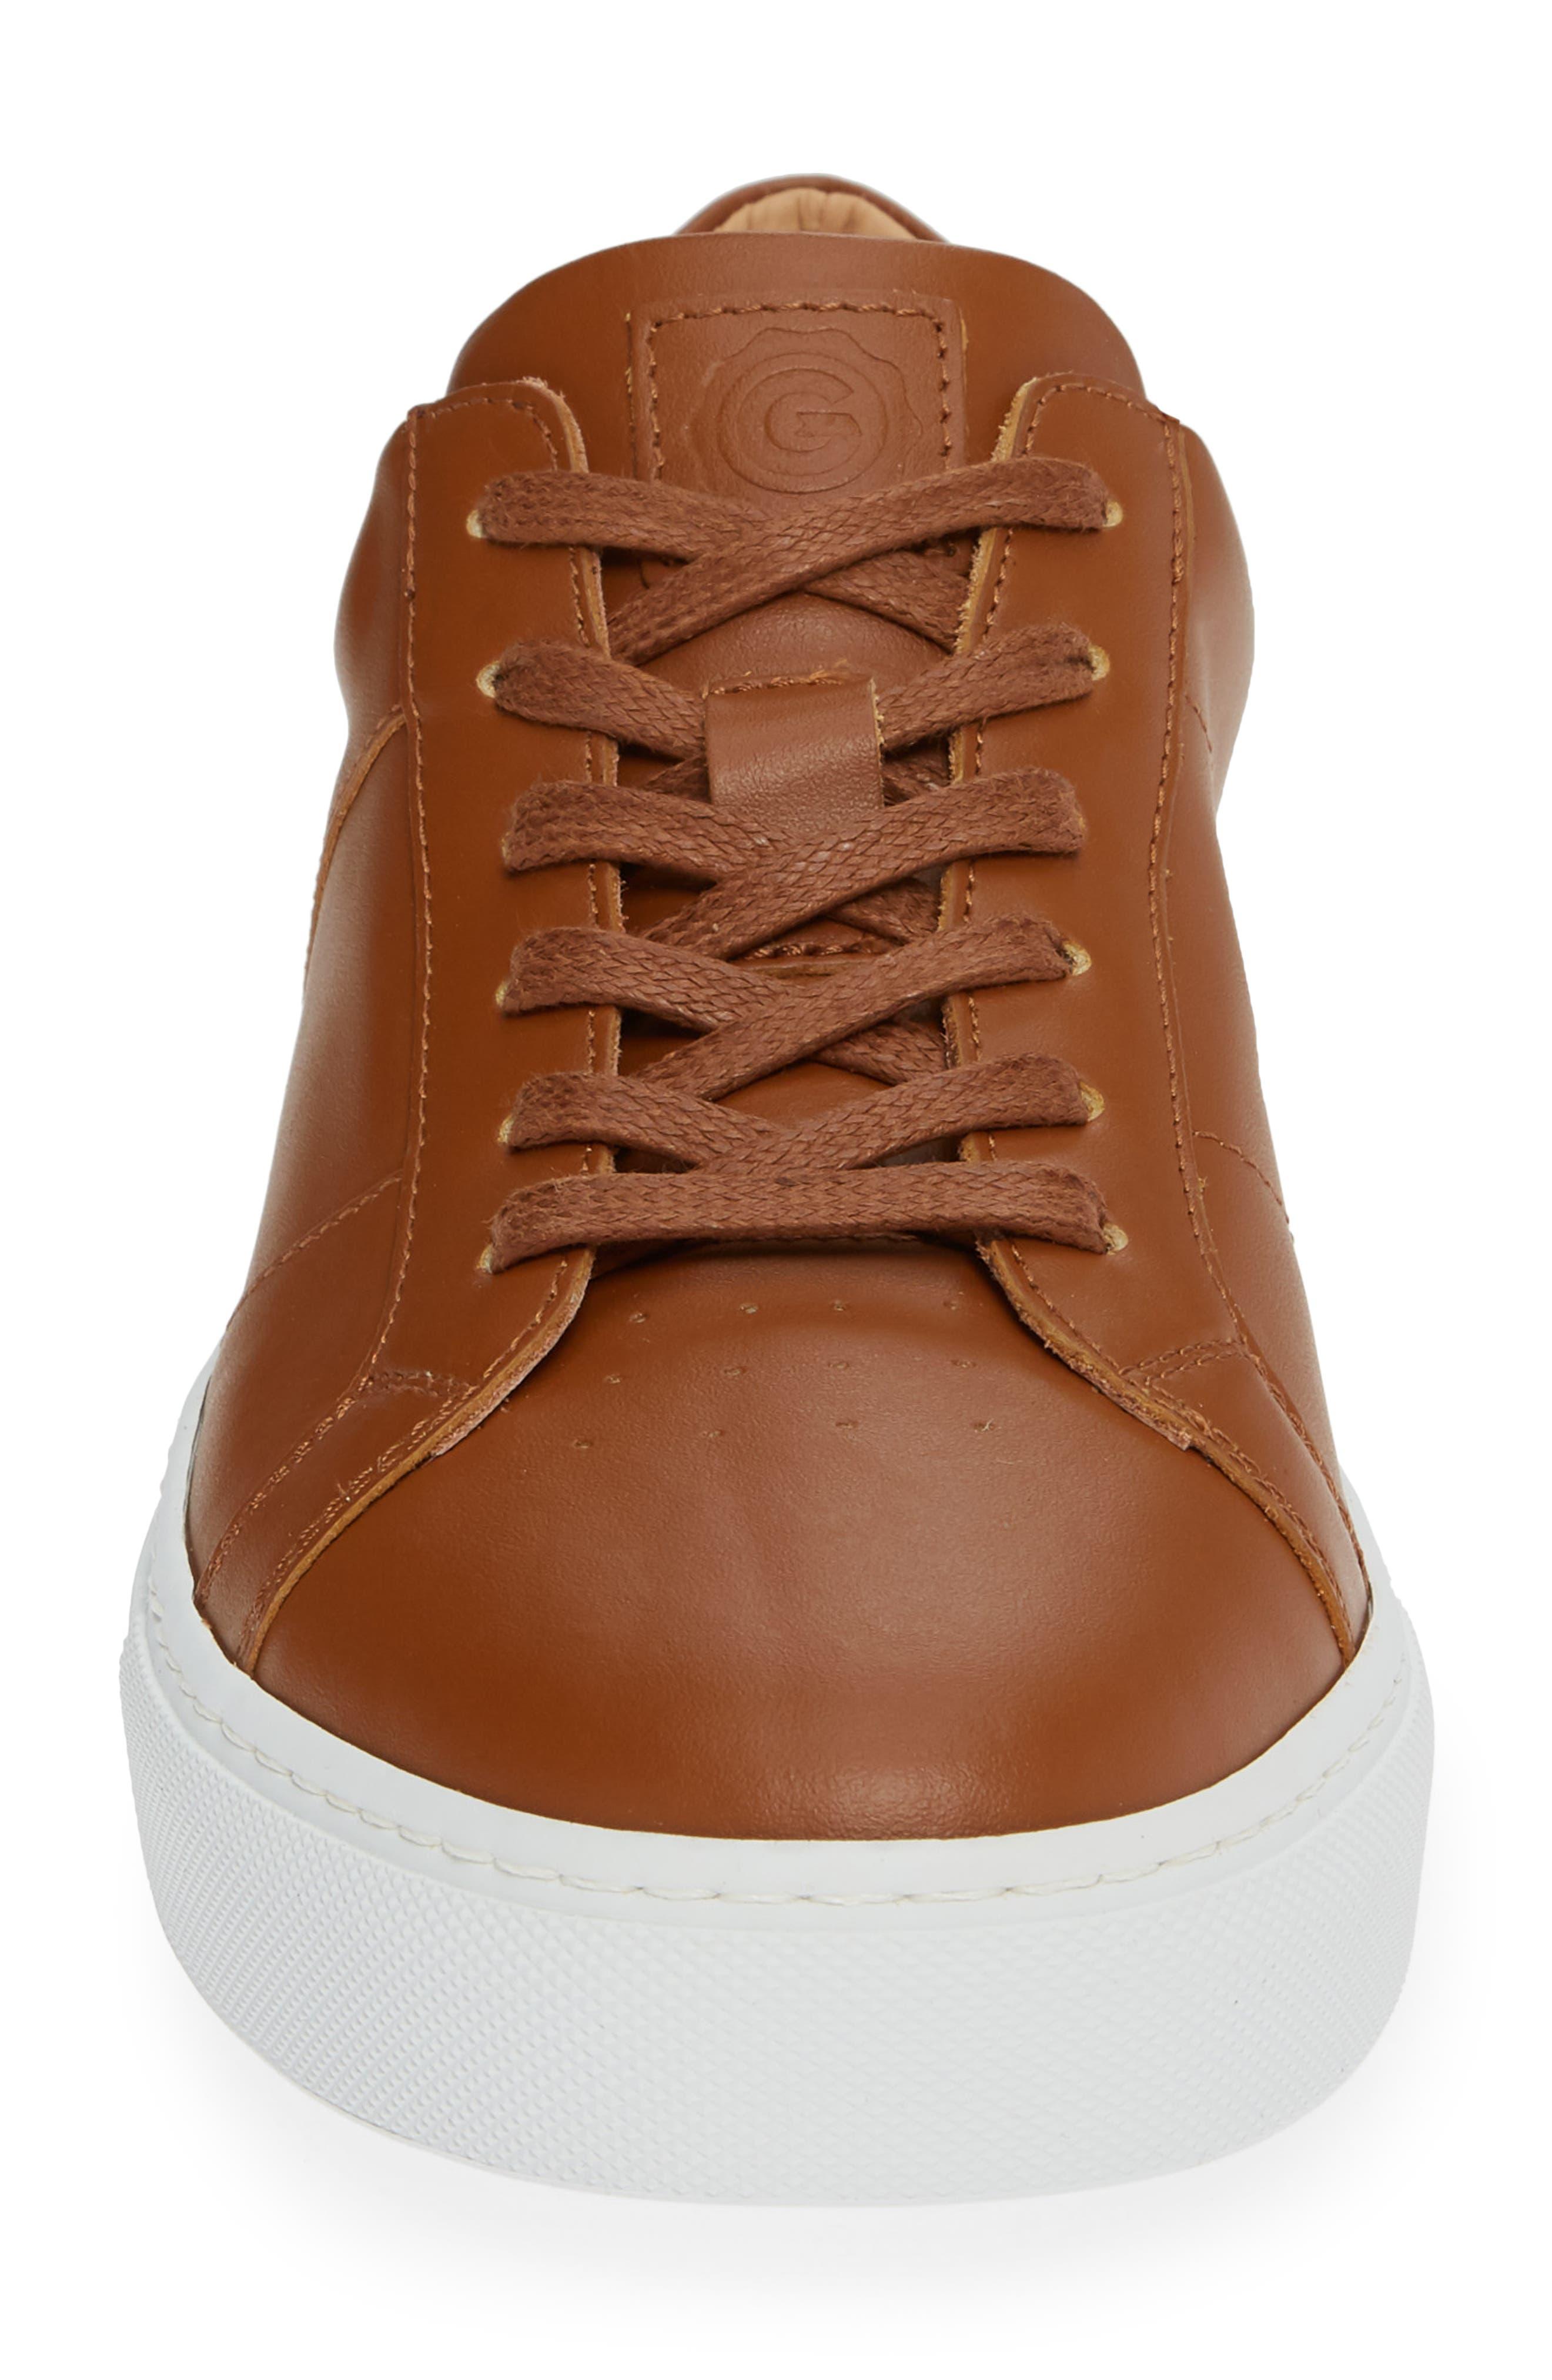 Royale Sneaker,                             Alternate thumbnail 4, color,                             TAN LEATHER